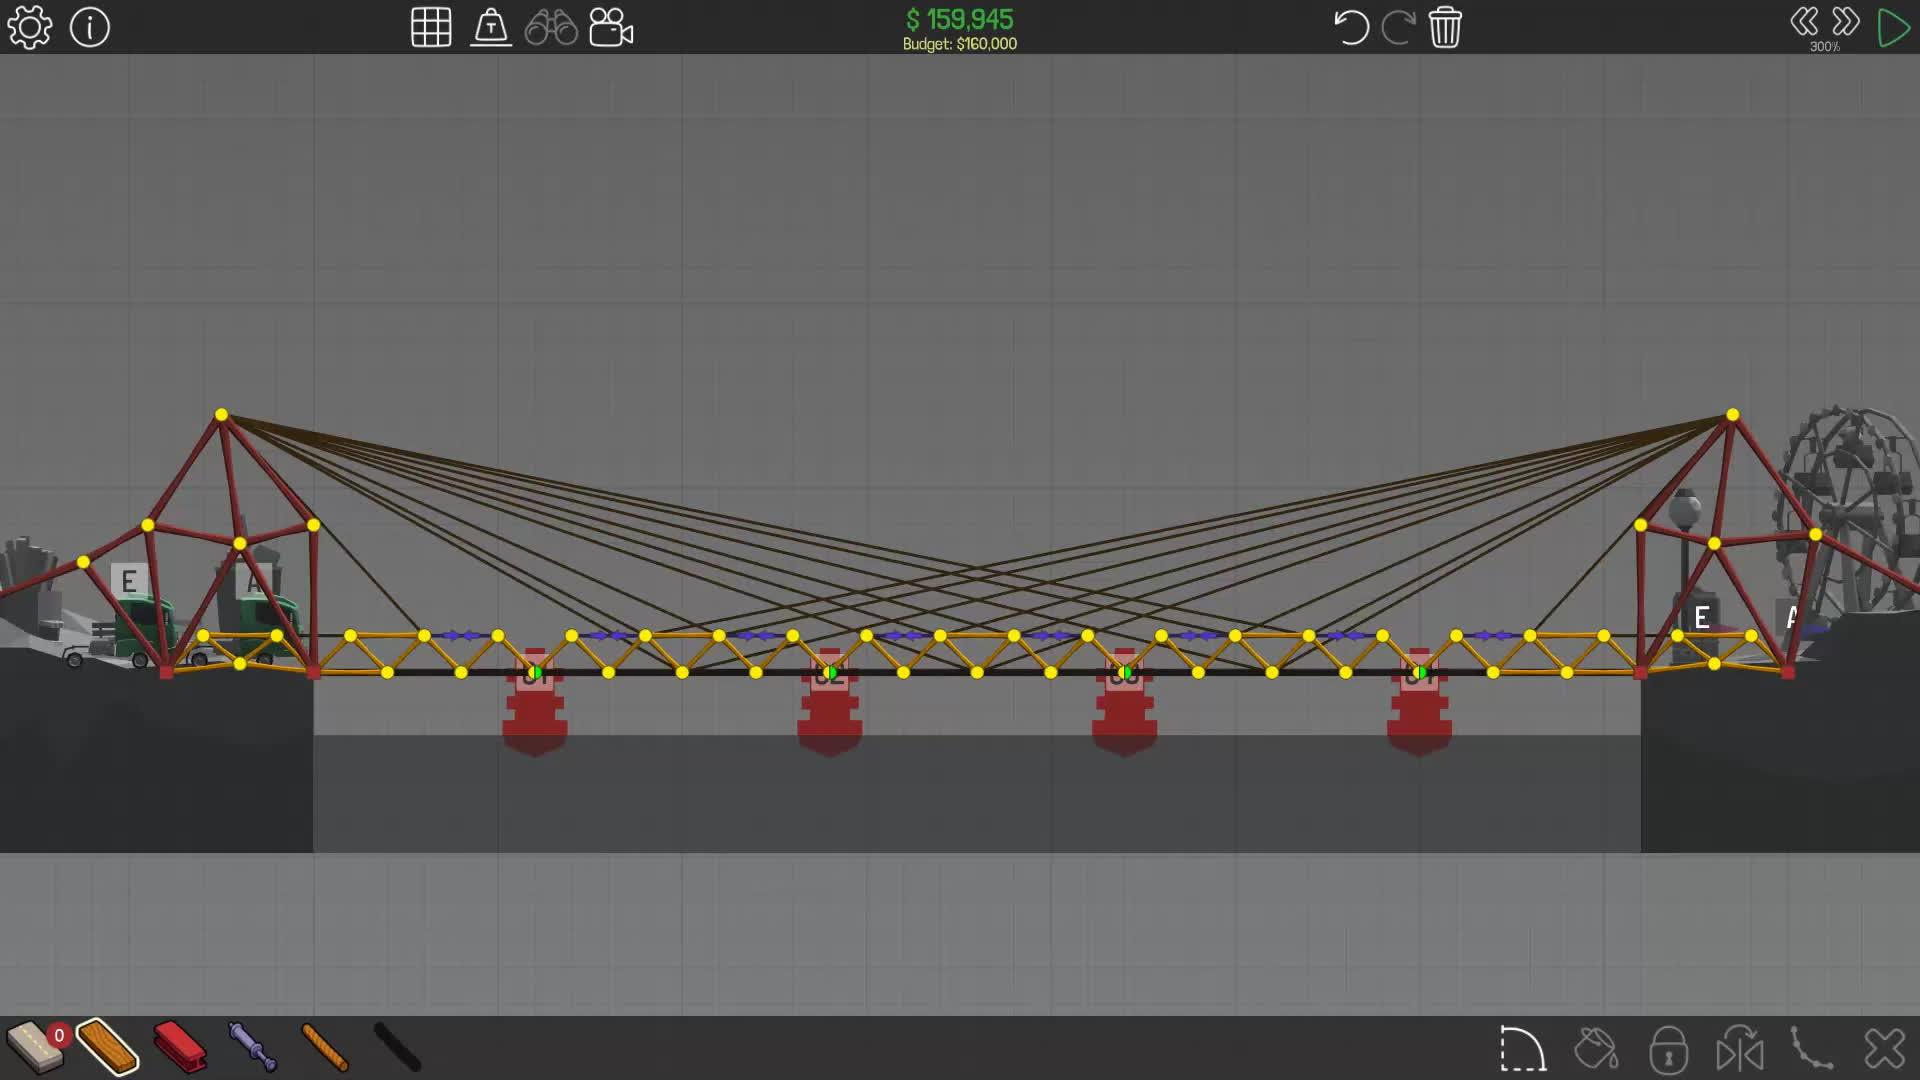 Polybridge, How To Build A Bridge GIFs